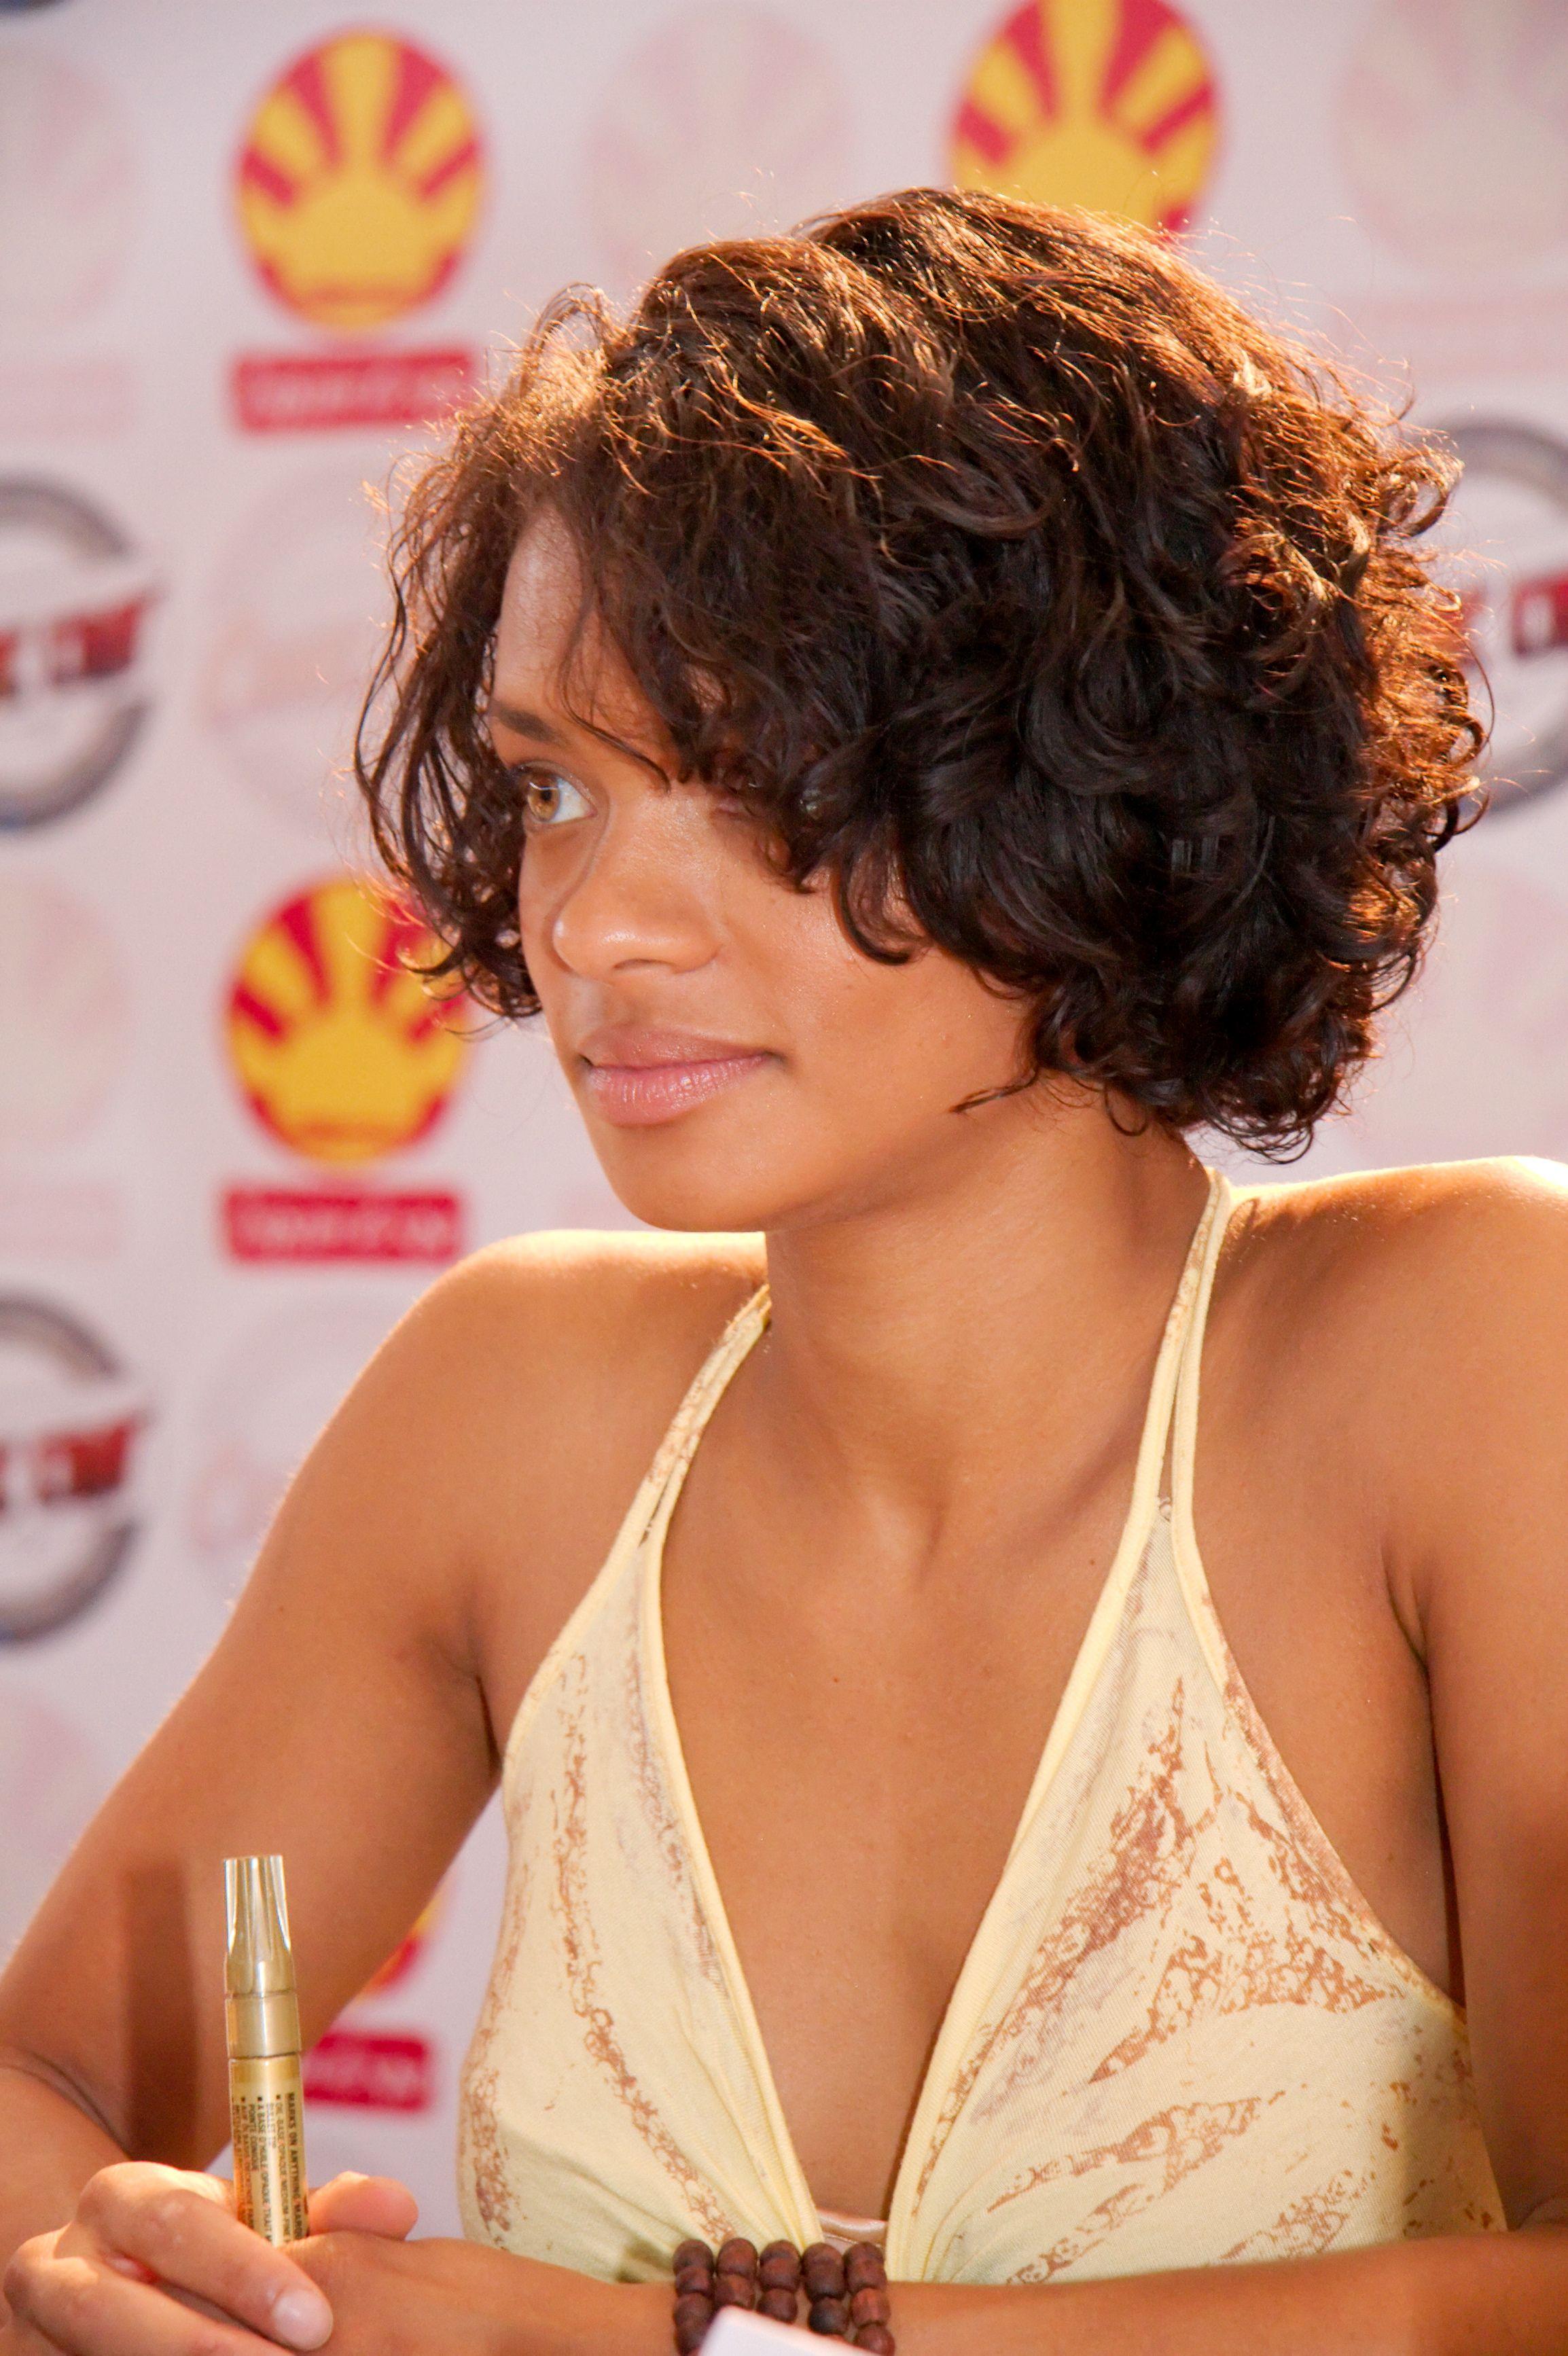 Discussion on this topic: Anita Raj, kandyse-mcclure/